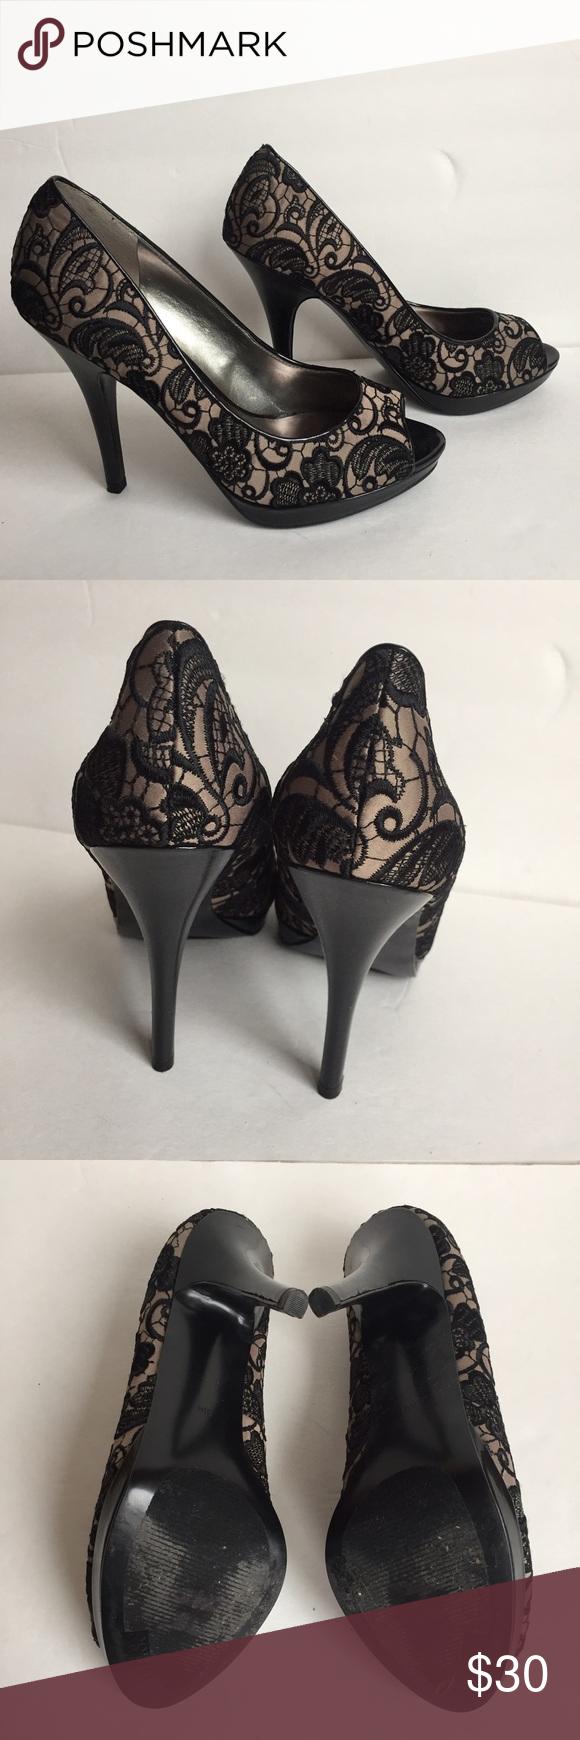 d1cc76a0f03 GUESS platform Black lace peep toe Heels 👠 9 1 2 Elegant sexy platform  black